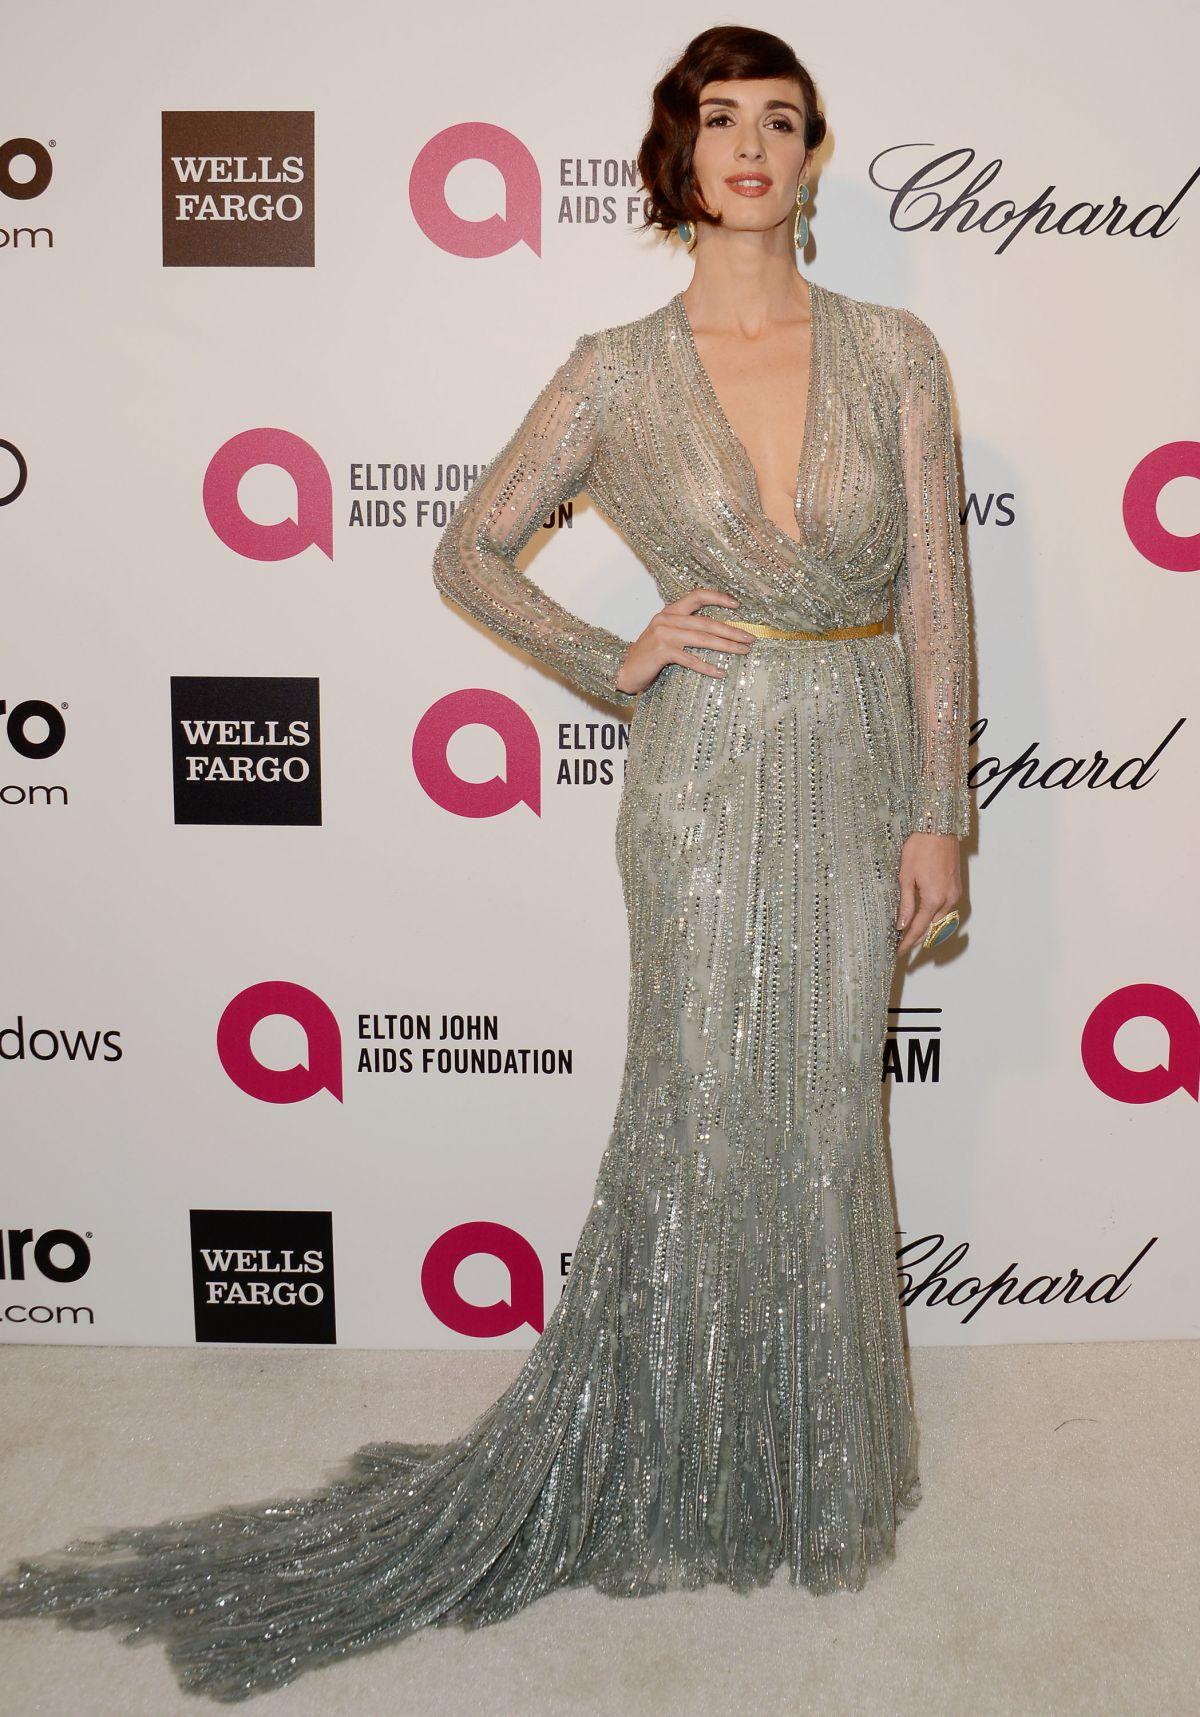 PAZ VEGA at Elton John Aids Foundation Oscar Party in Los Angeles